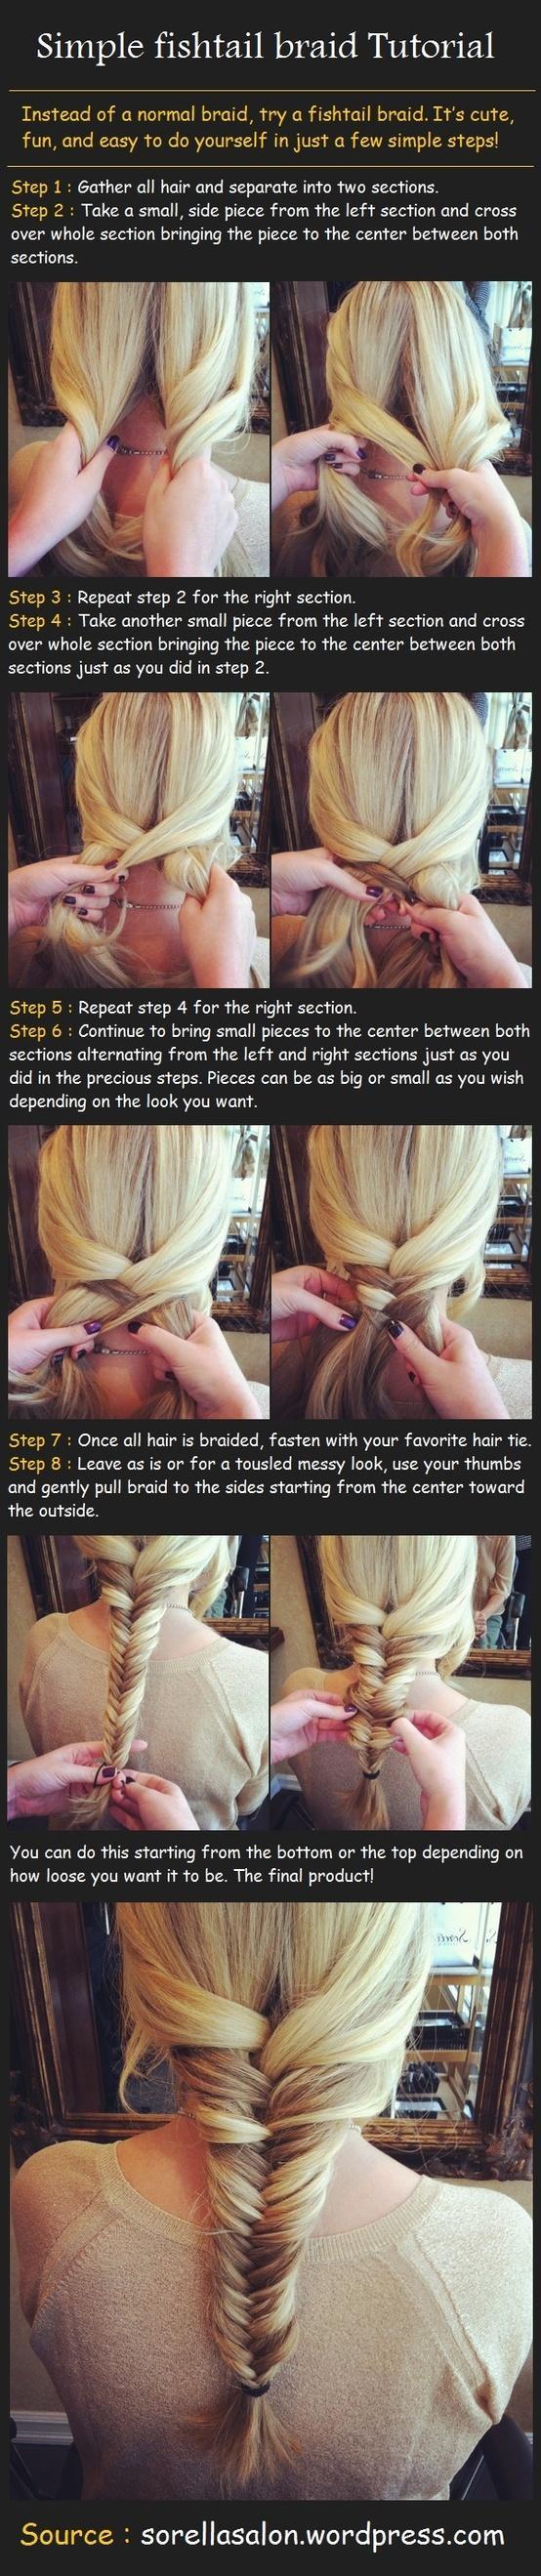 Autors: manpatiik Hair 2.